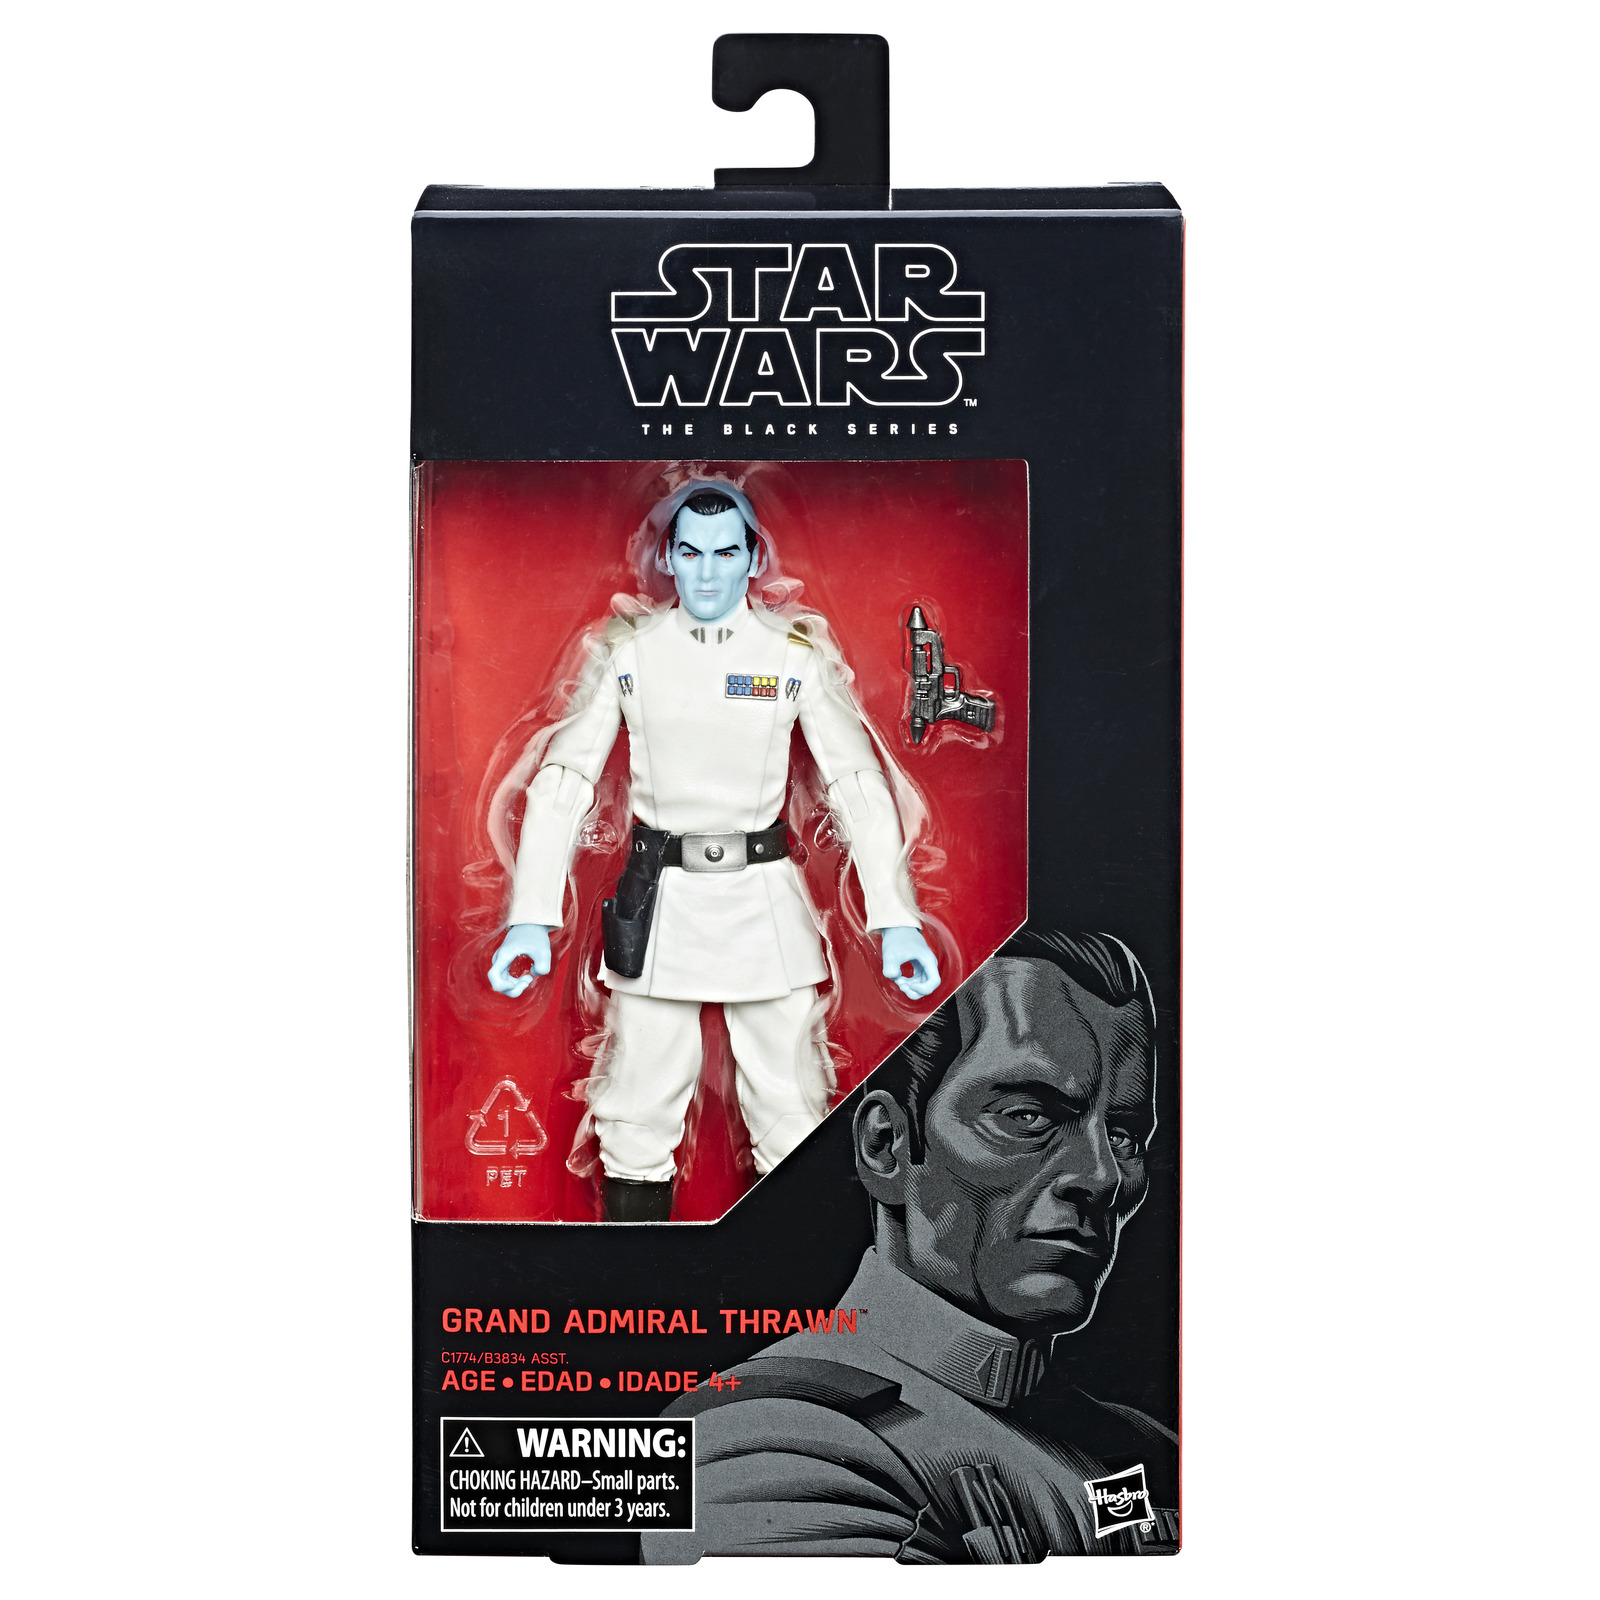 Star Wars: The Black Series - Grand Admiral Thrawn image